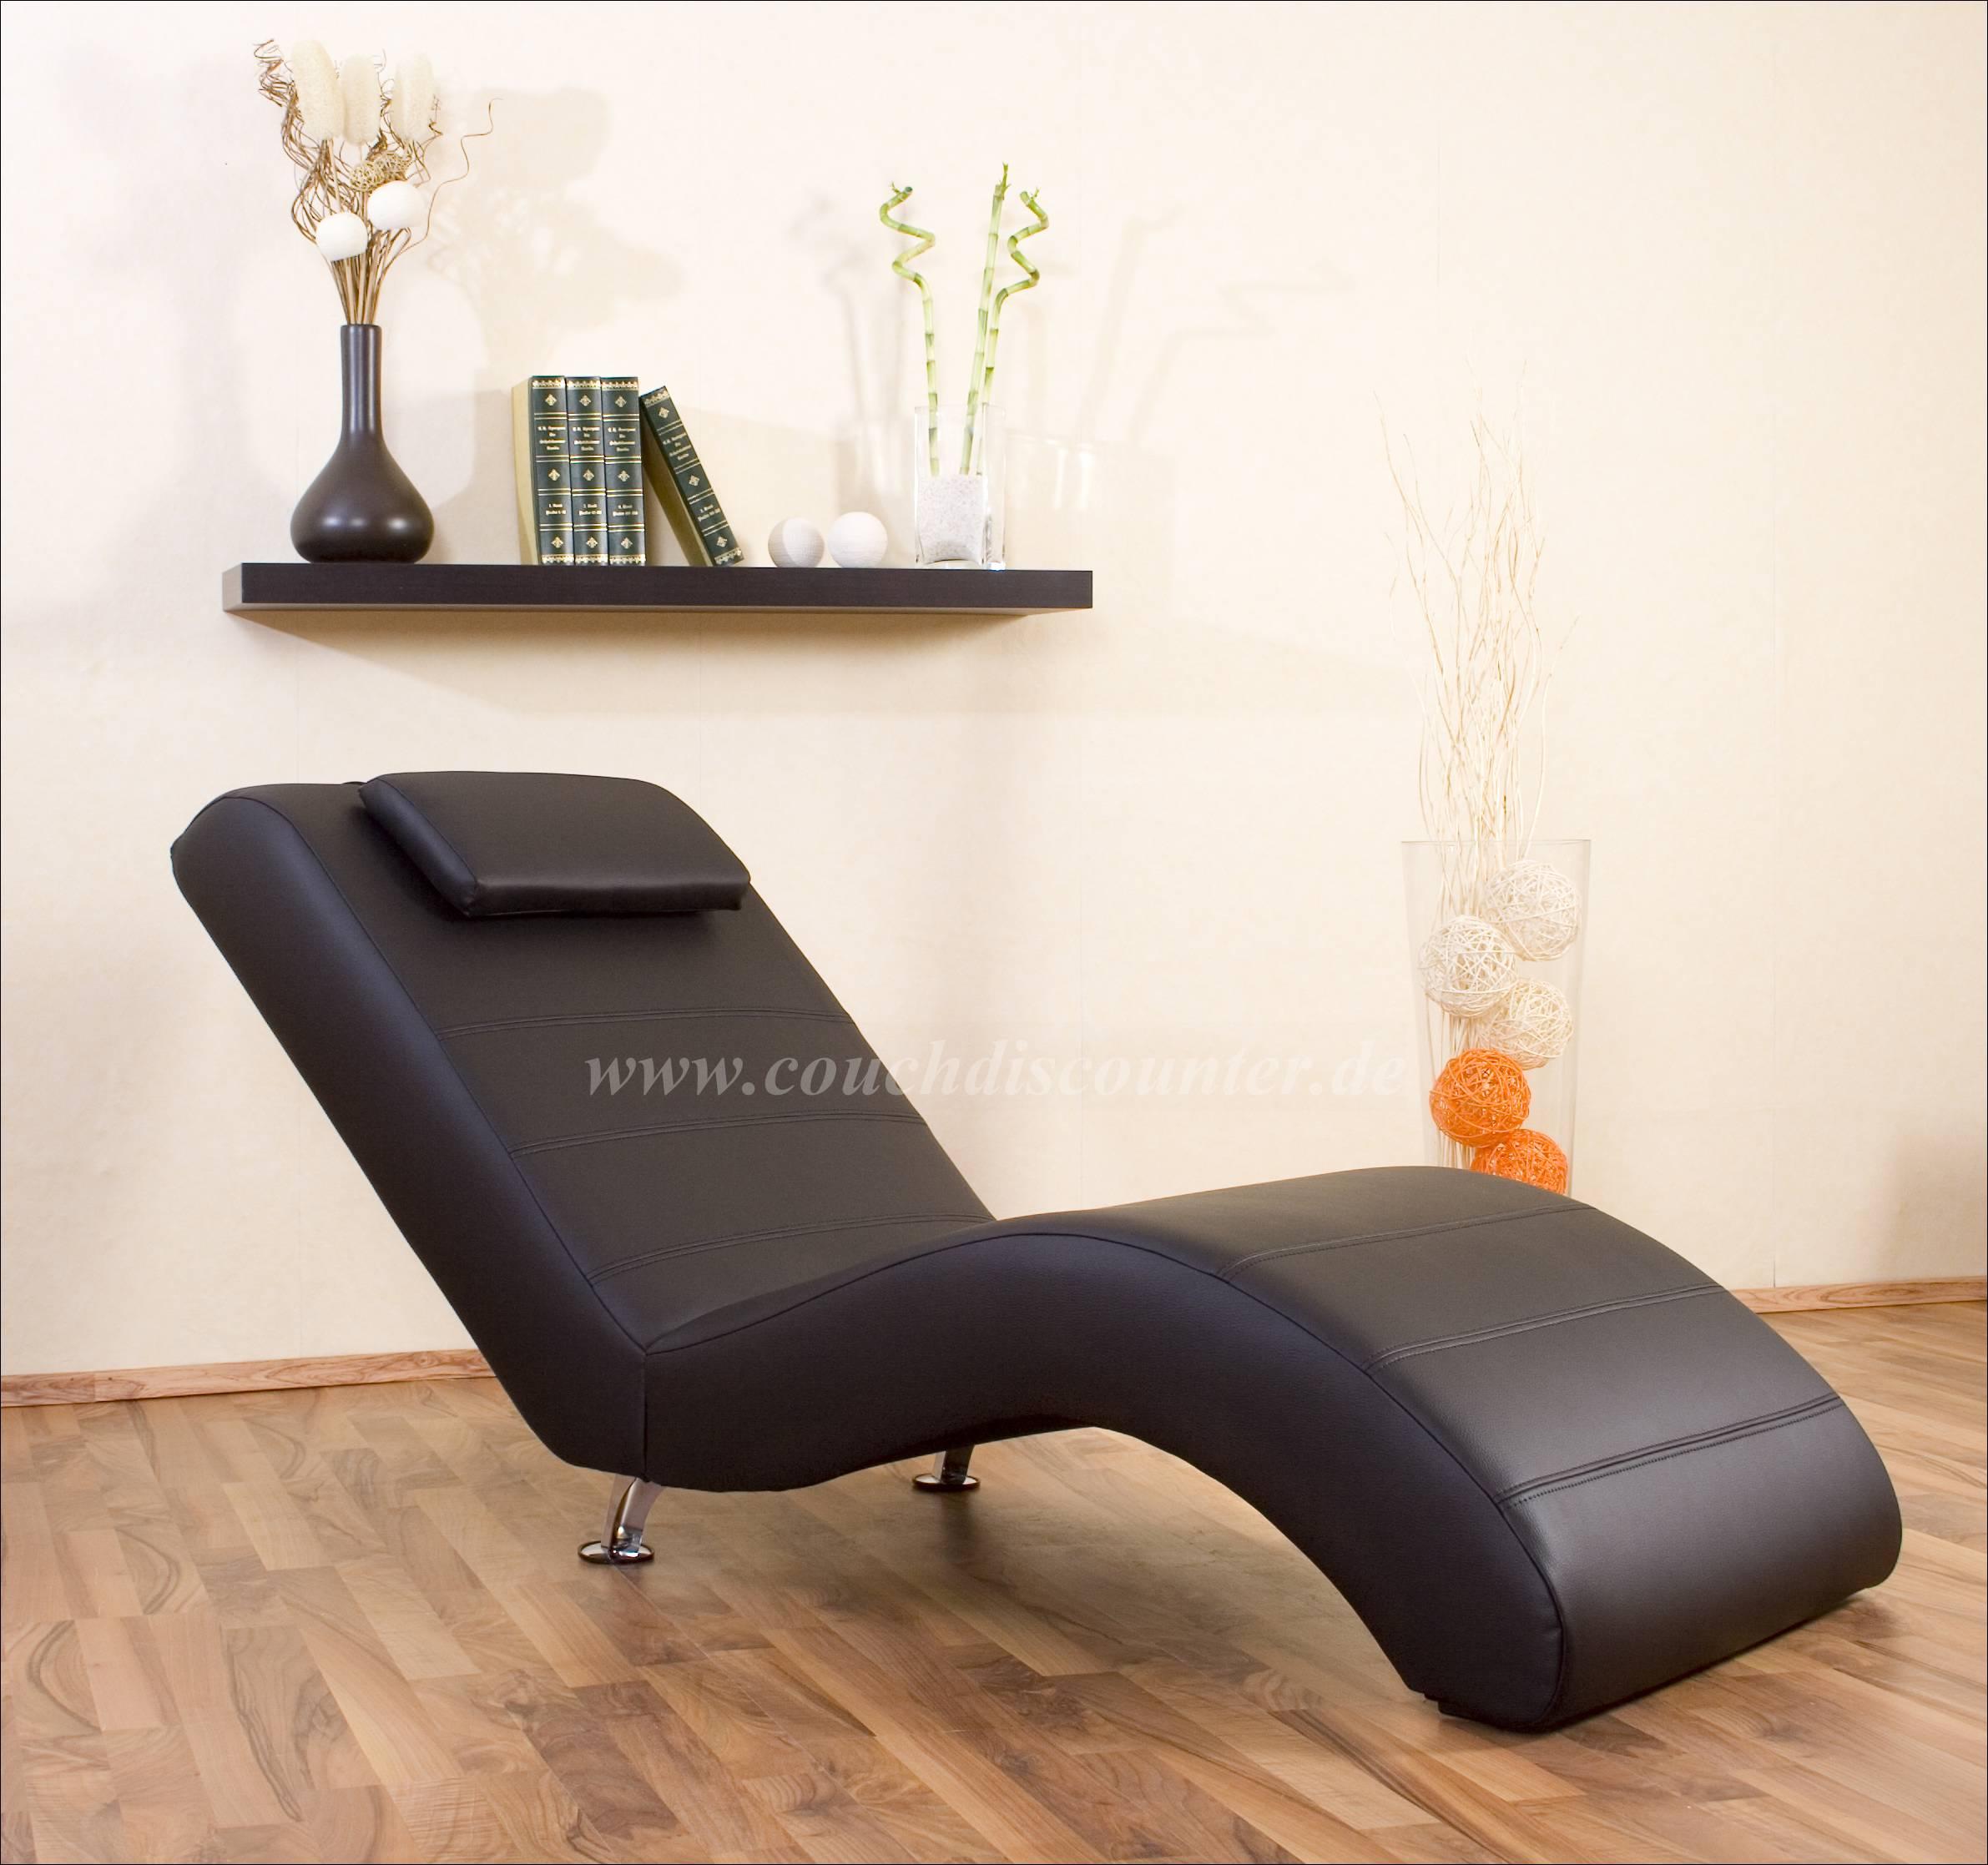 design relaxliege simple designer relaxliege sessel leder verstellbar beige wie neu with design. Black Bedroom Furniture Sets. Home Design Ideas